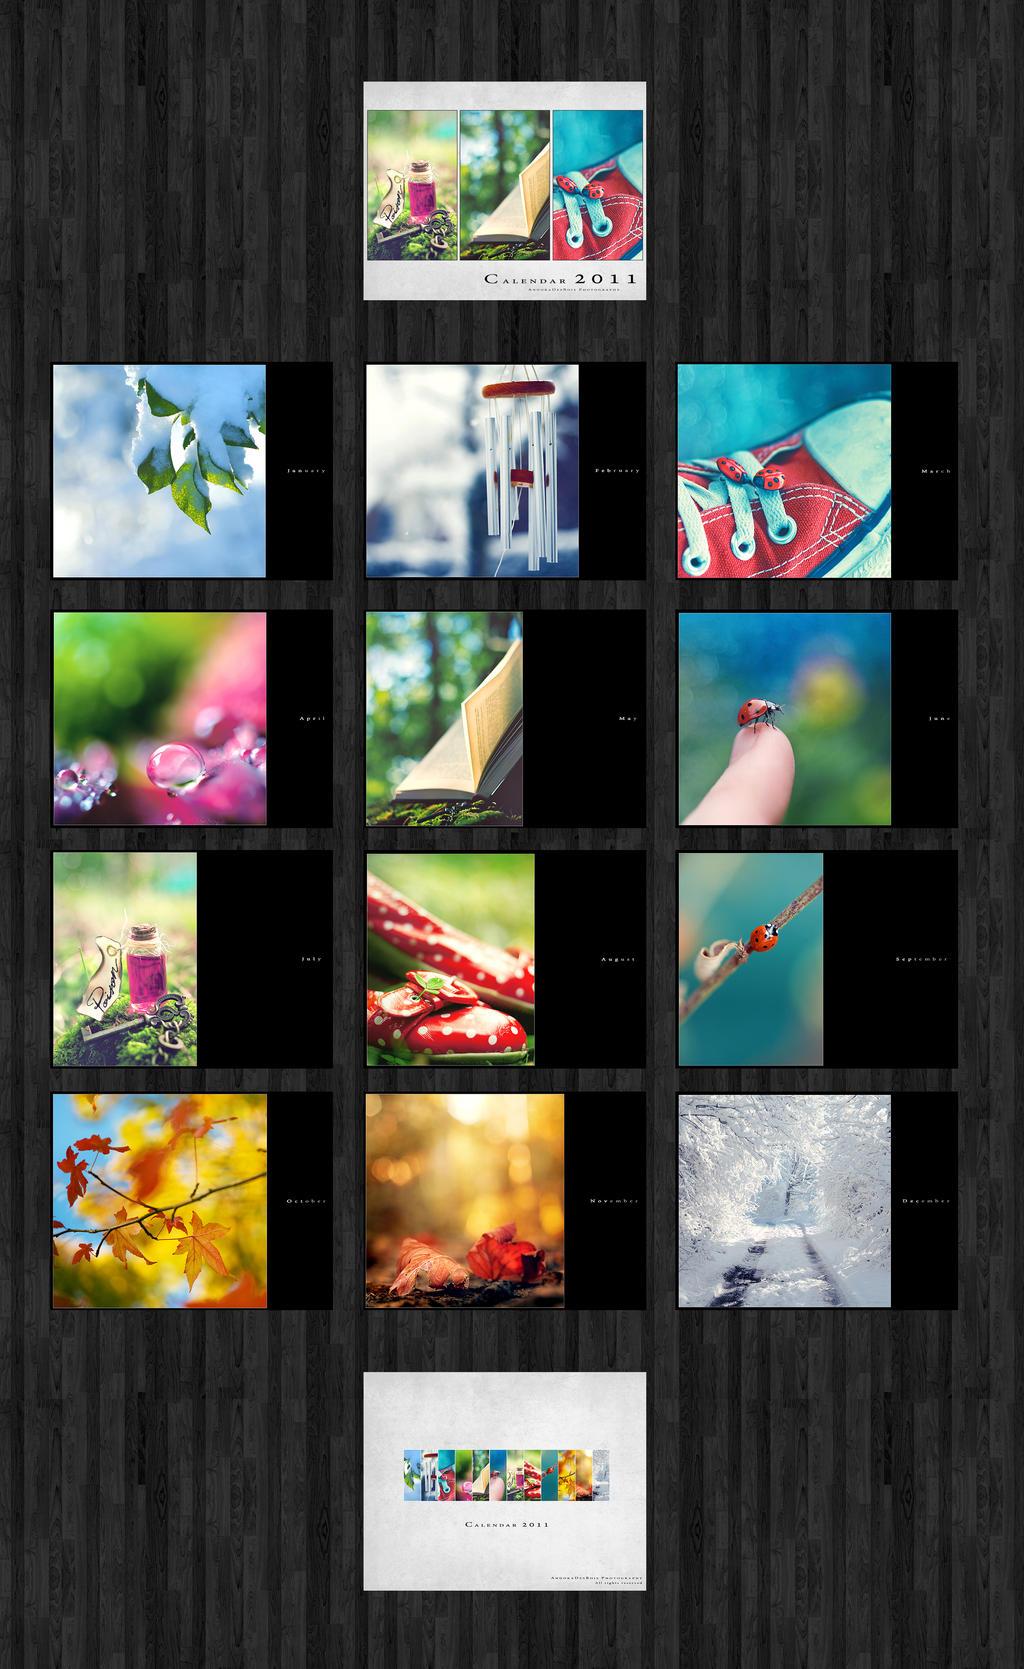 Calendar 2011 AndokaDesBois by andokadesbois